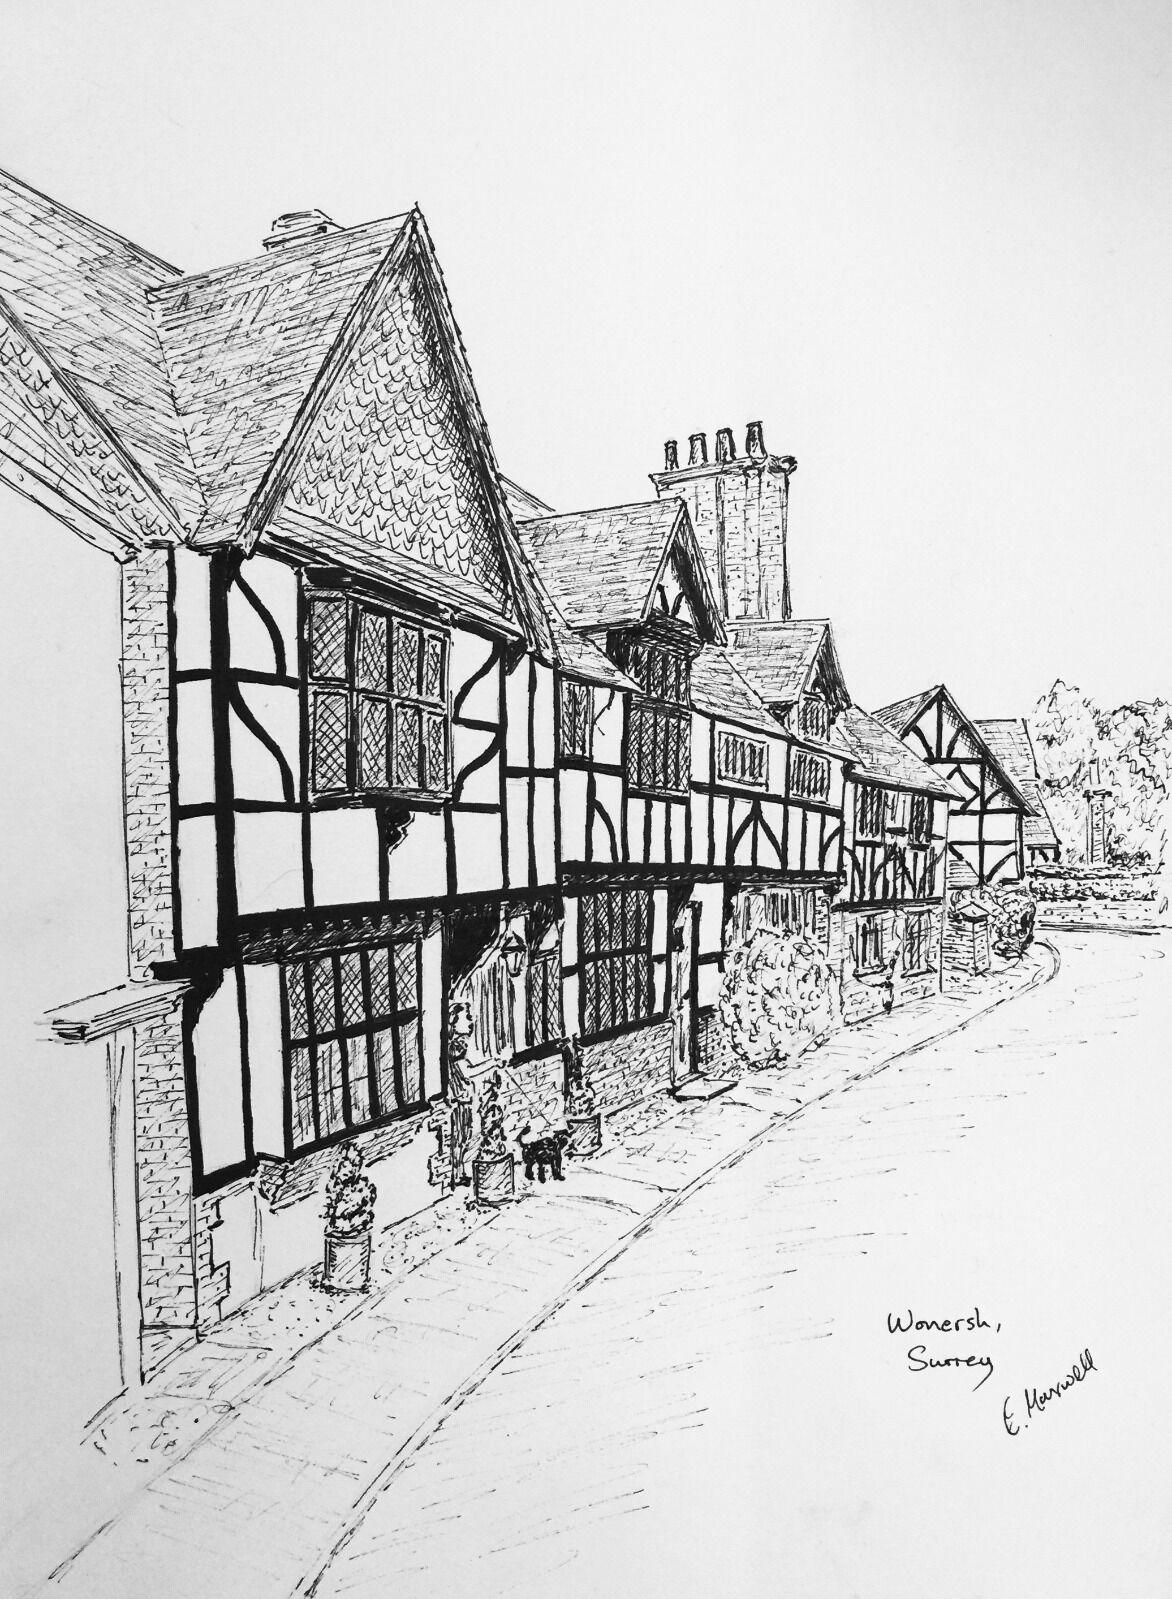 Wonersh, Surrey